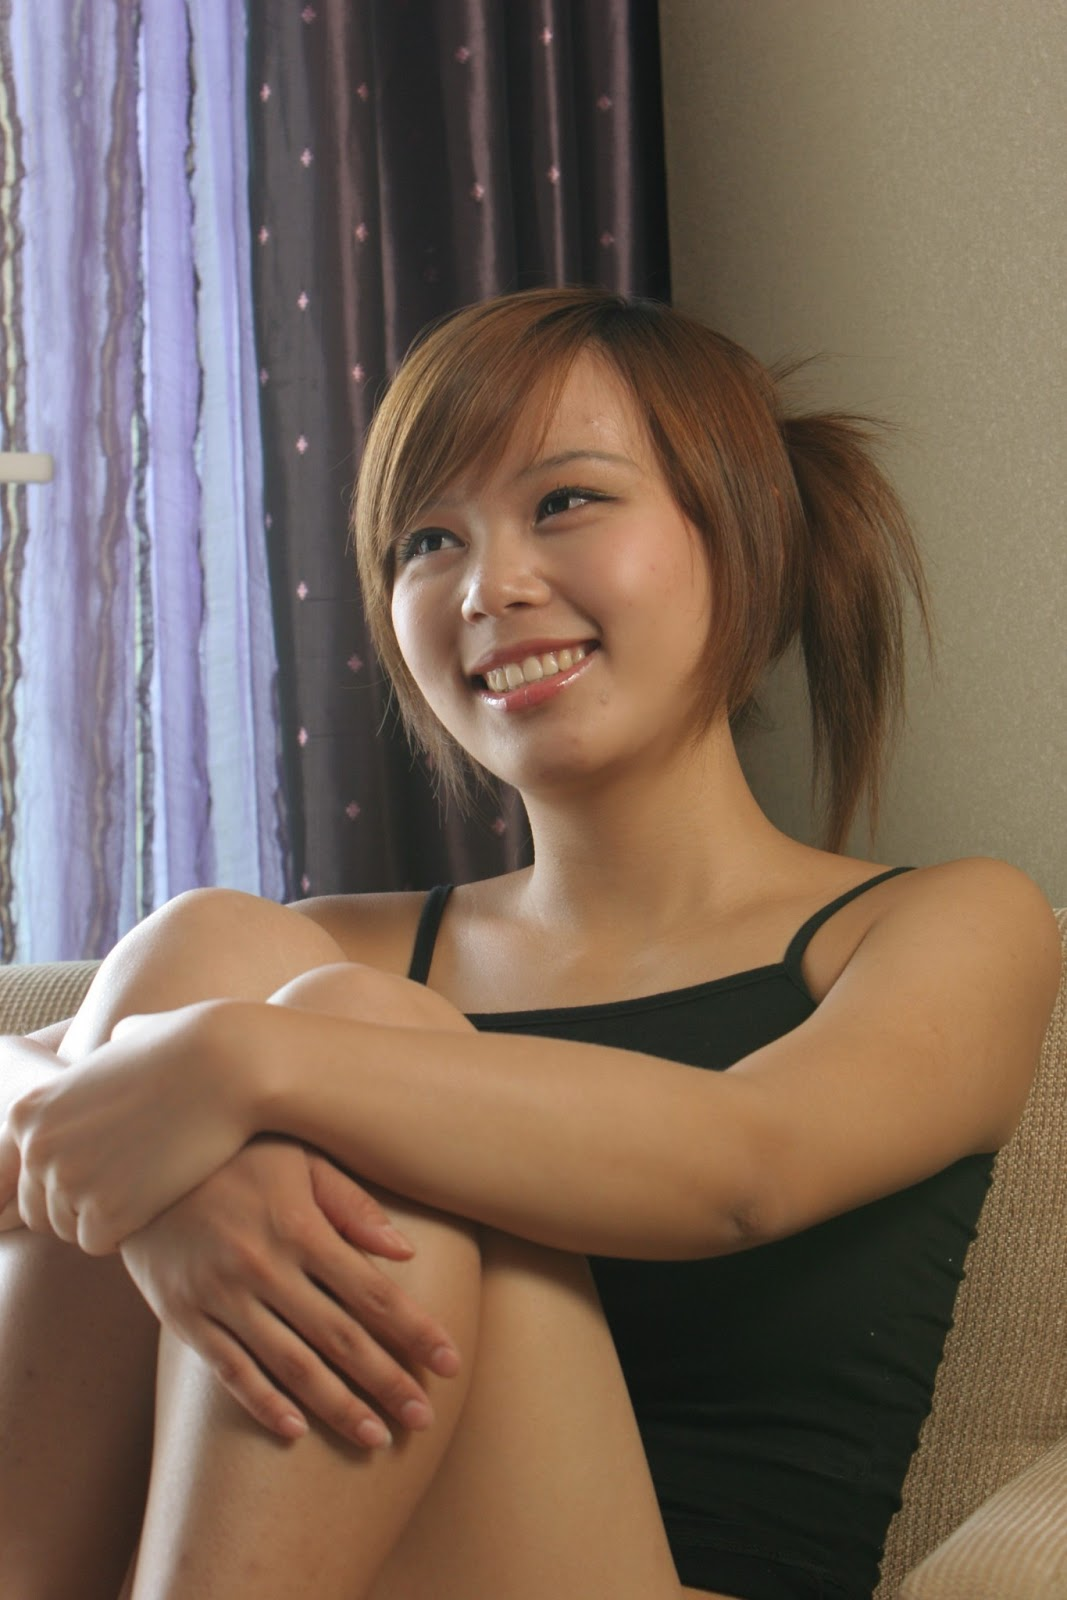 Girl next door gets ambush creampie on casting couch 6